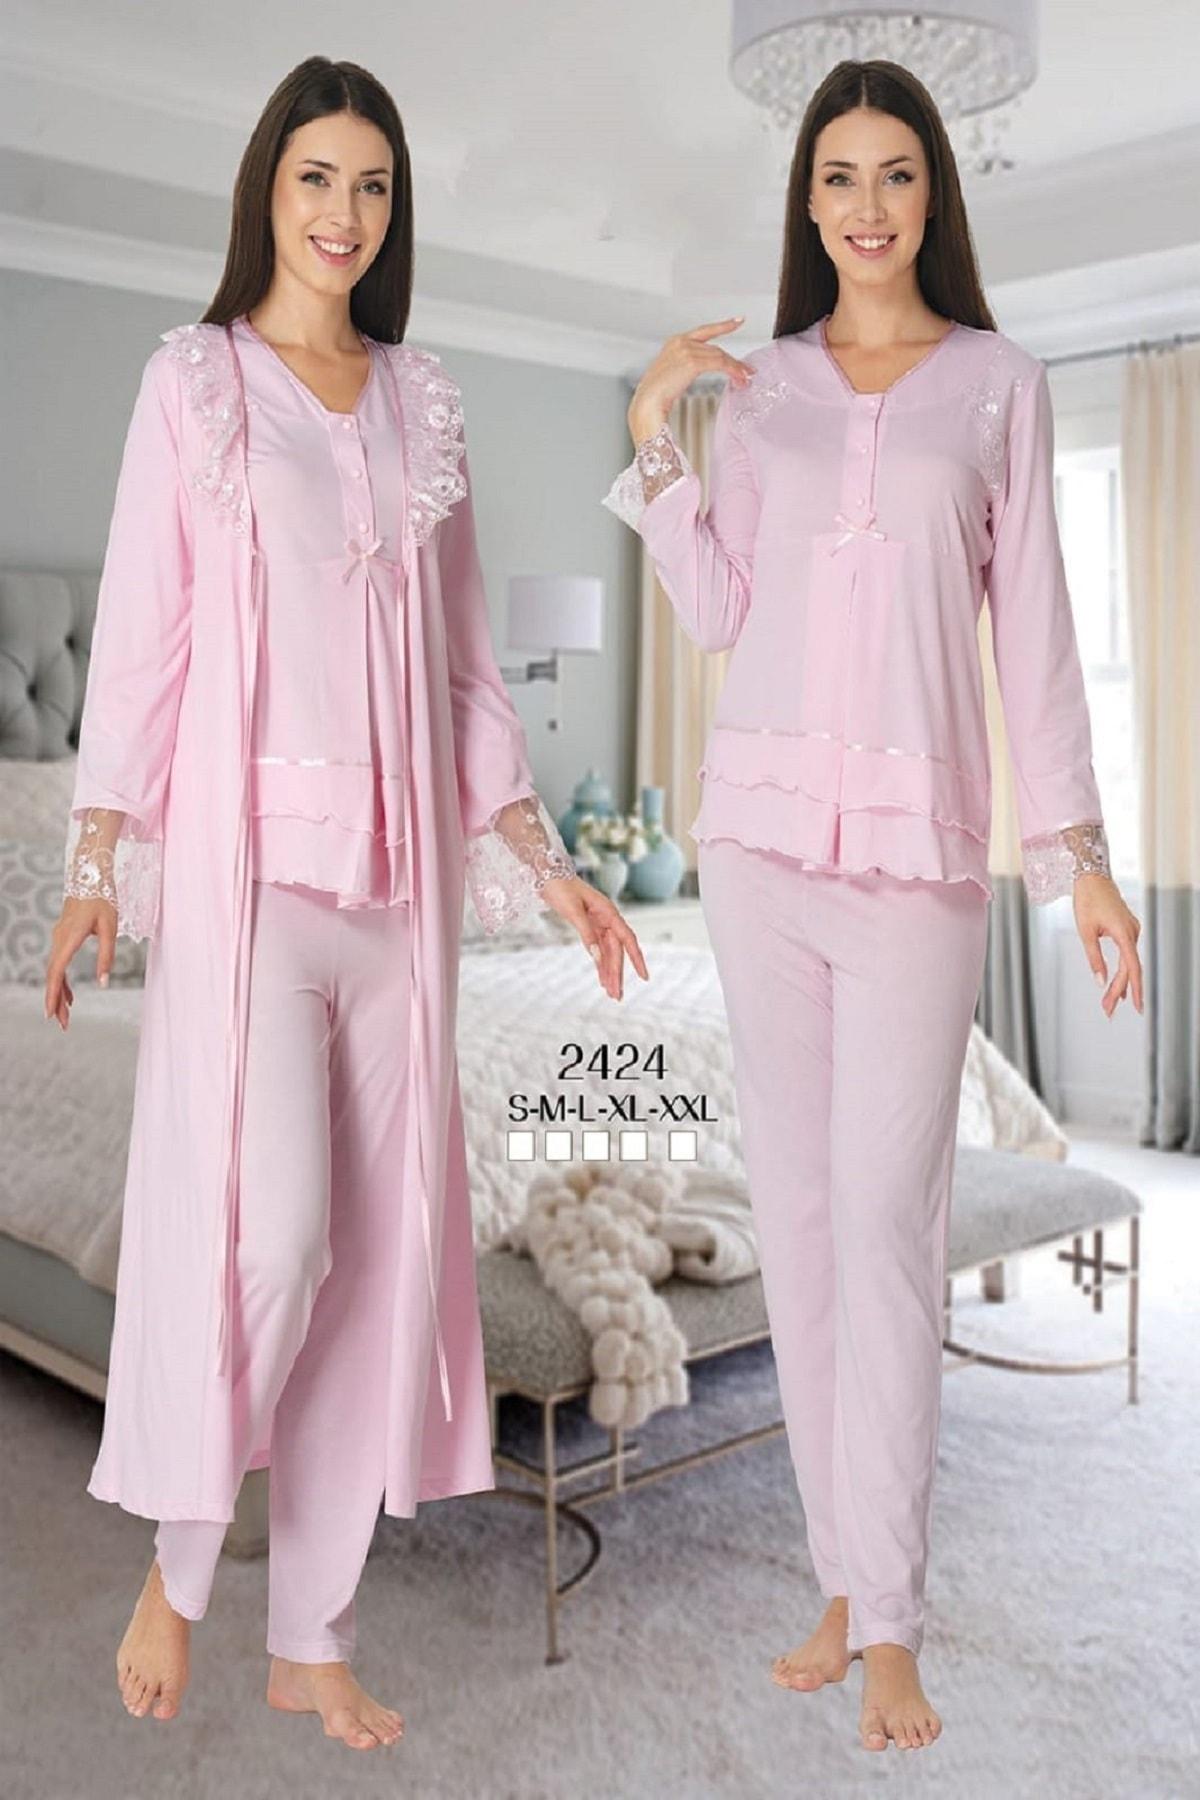 Effort Pajamas Women Ecru Long Sleeve Maternity Pajamas Set Dressing Gown enlarge